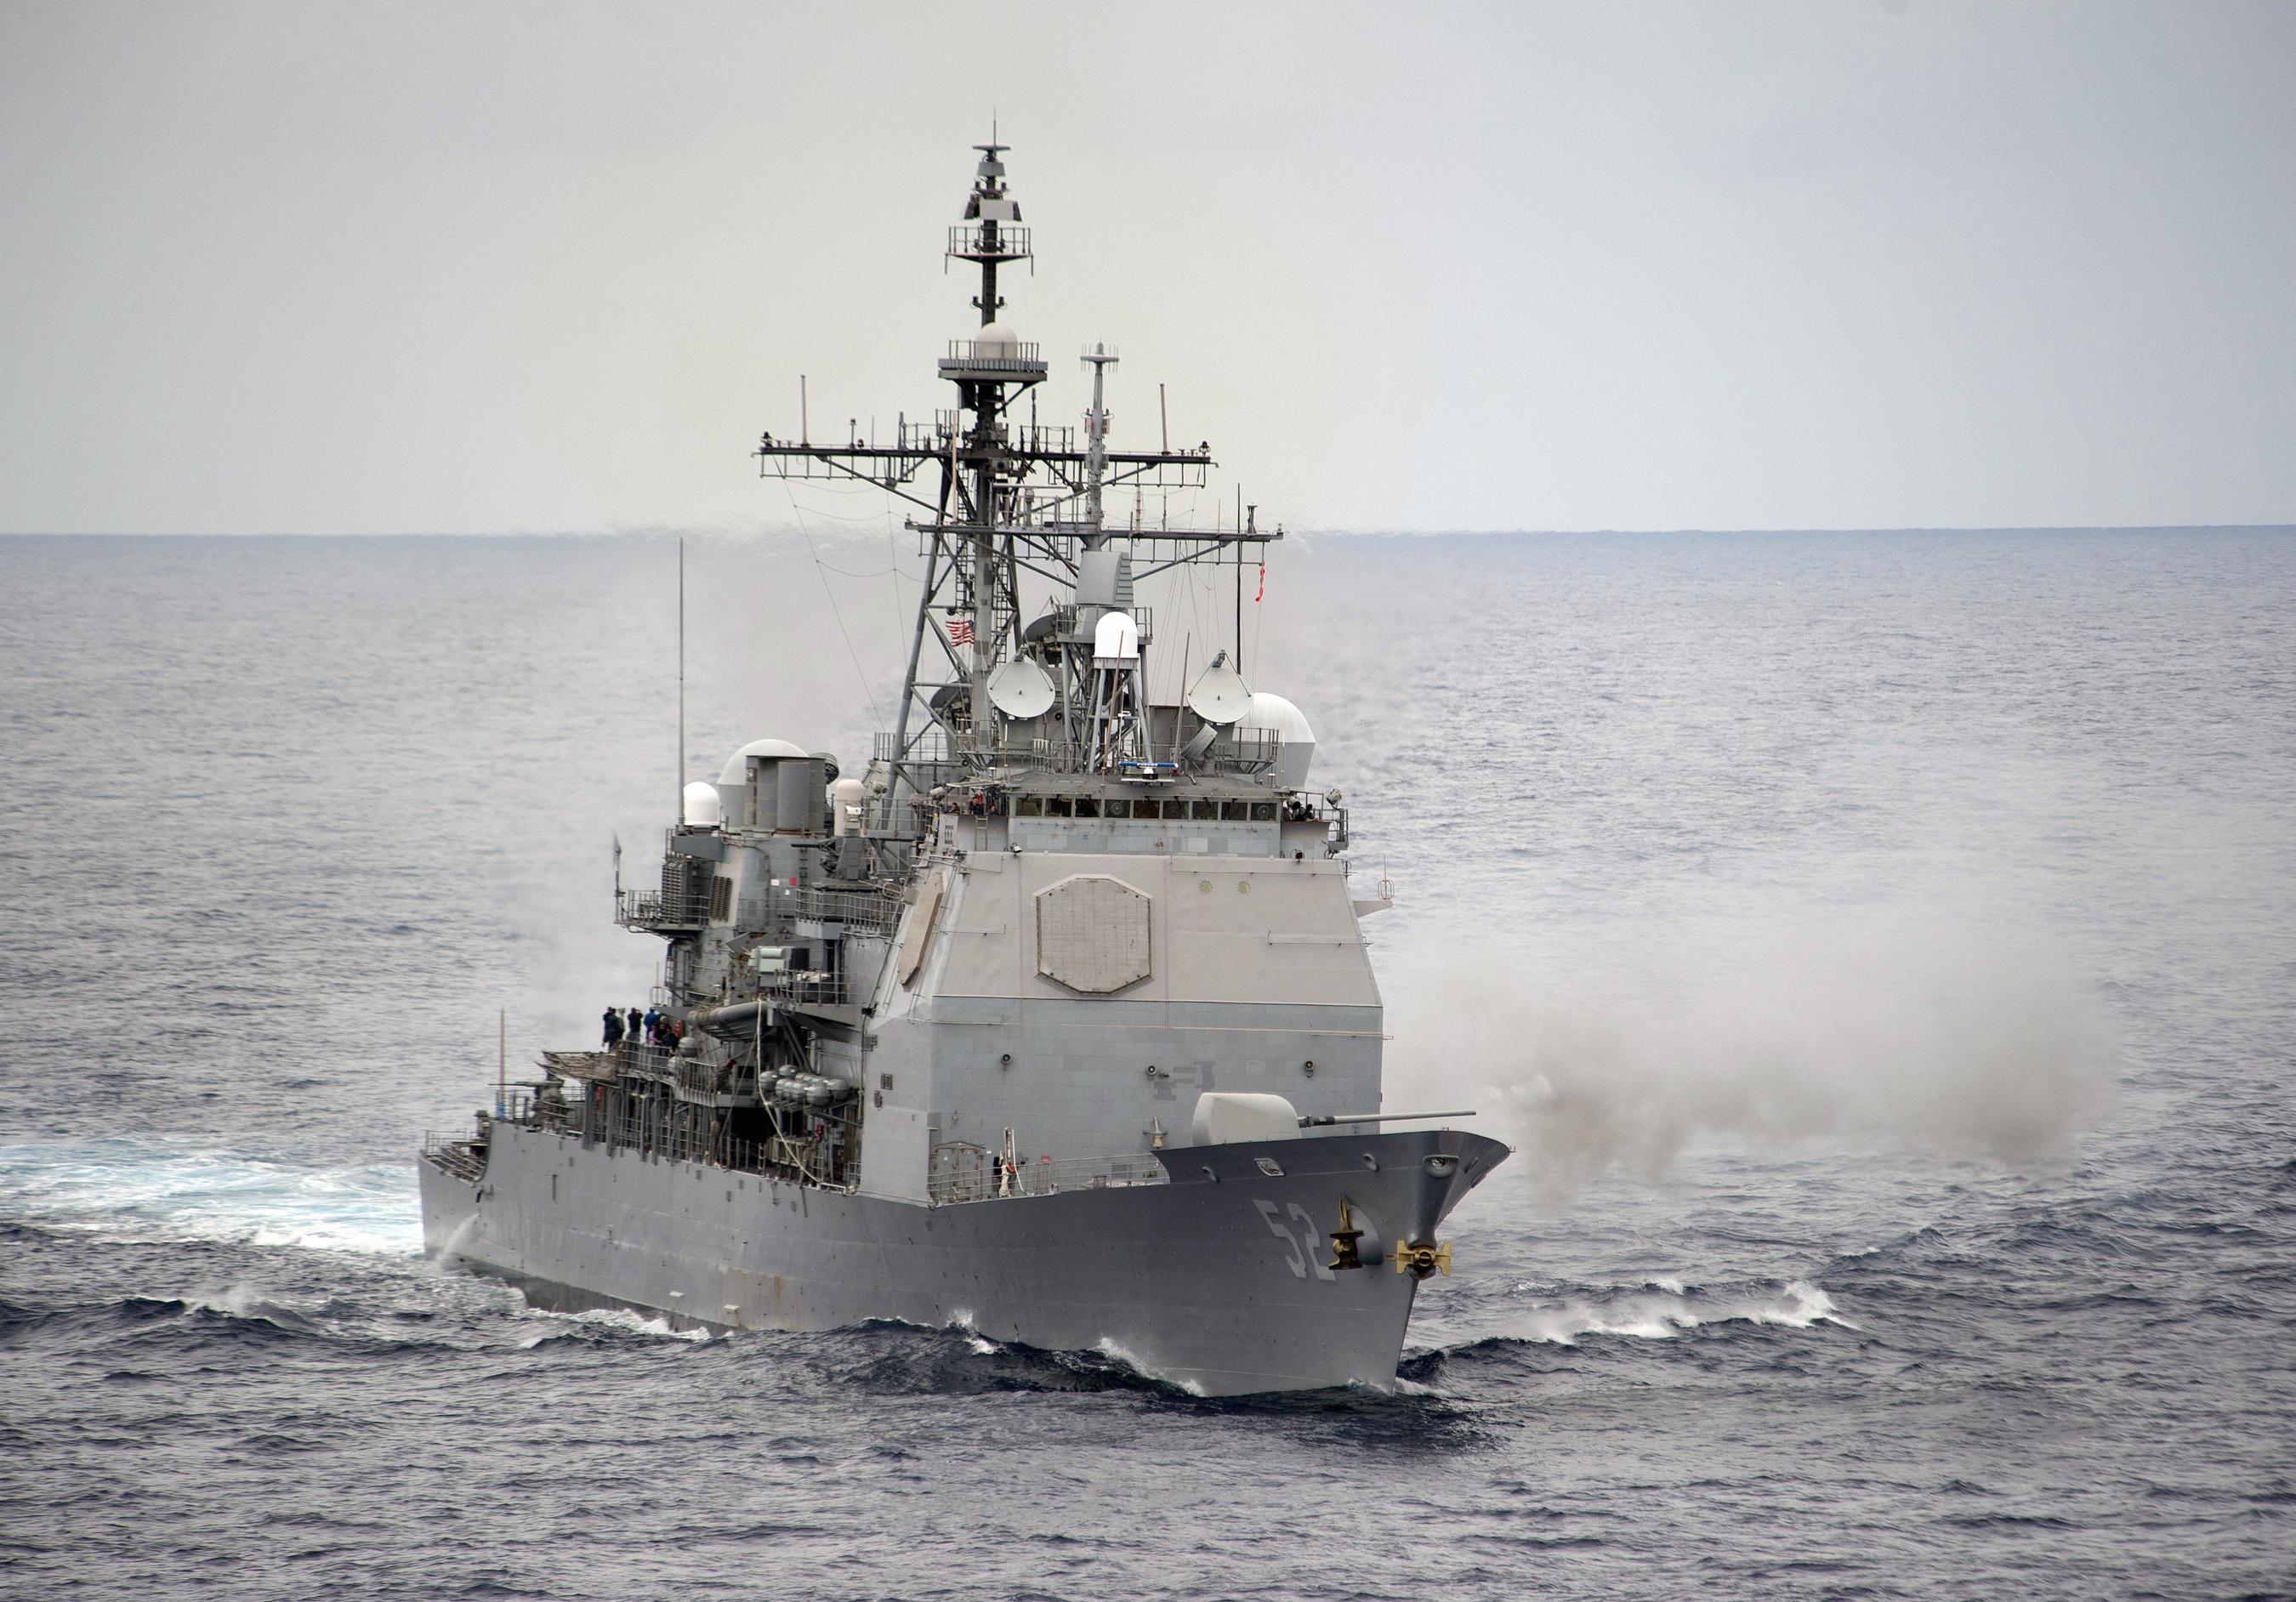 Ticonderoga-class cruiser - Howling Pixel